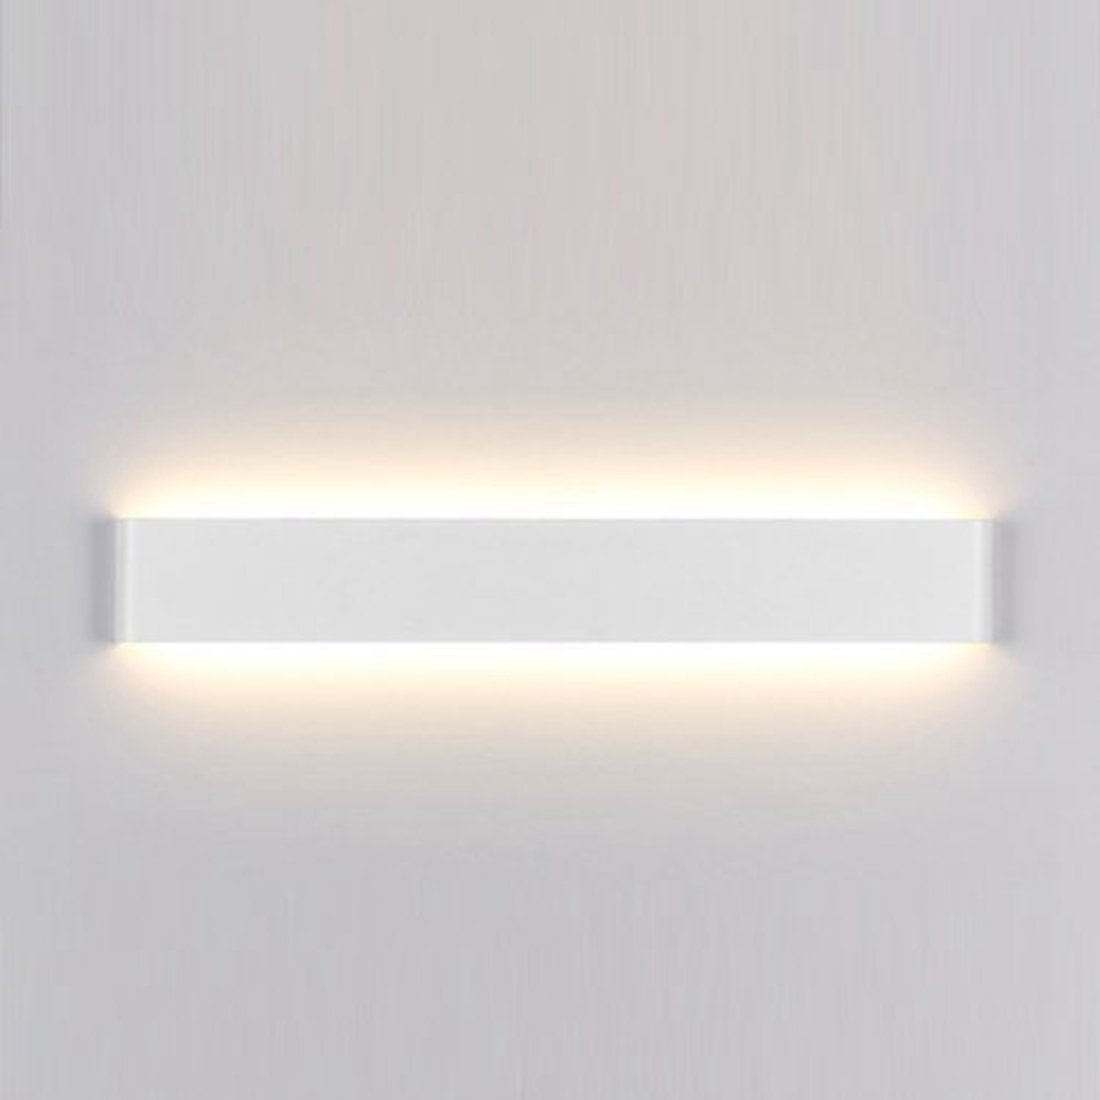 Alotm Modern Aluminum 12w LED Bedroom Wall Lights Fixture Decorative Lamps Indoor Wall Light Sconce Lighting Lamp Hallway Corridor Stairs Hotels Lights, Neutral Light